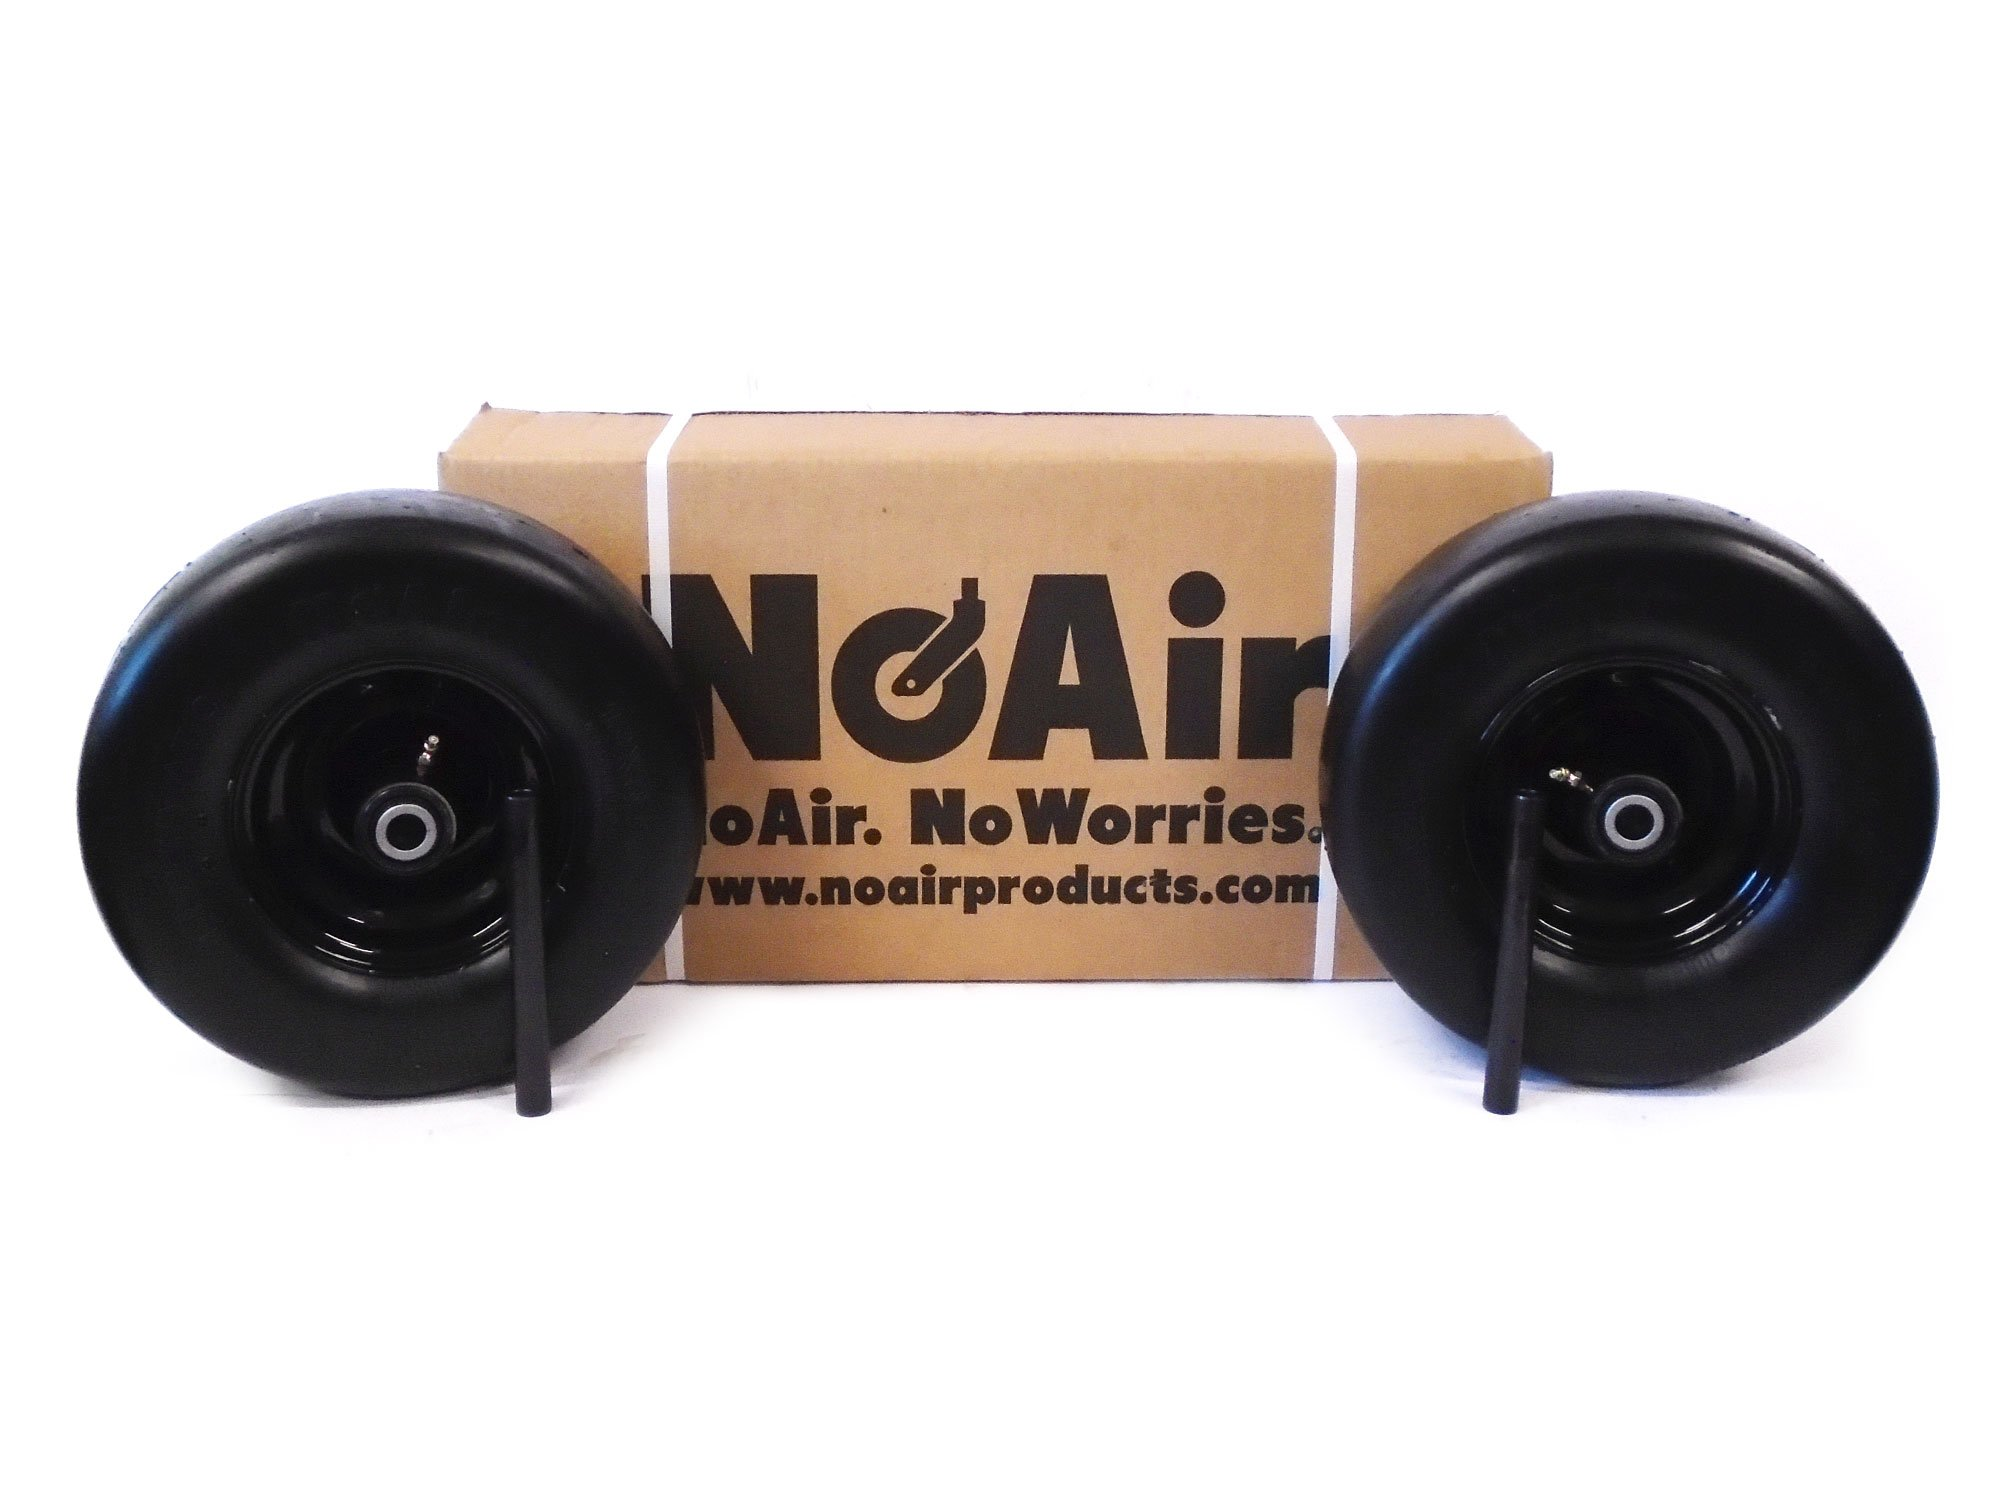 (2) BigDog Flat Free Diablo Alpha MP Stout Wheel 13x6.50-6 605065 605035 Scag by NoAir (Image #1)